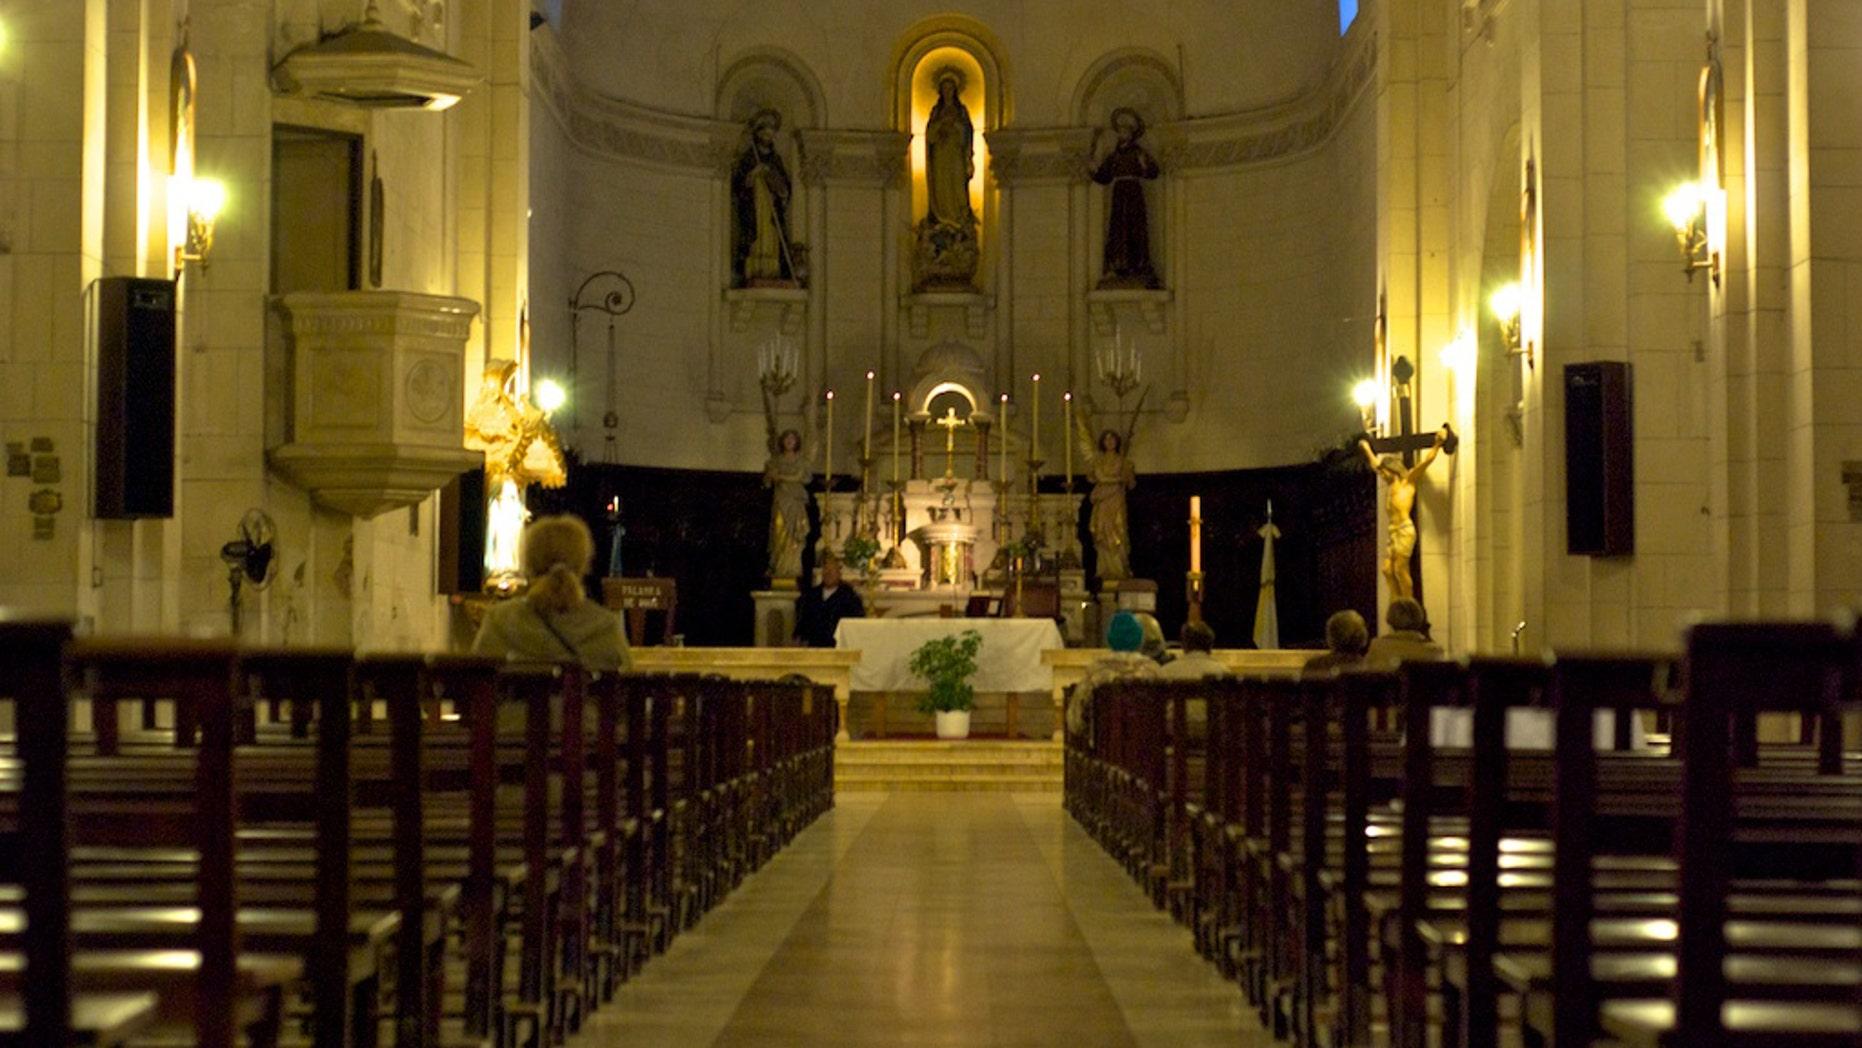 The interior of the church of San Francisco in La Plata where Juan Domingo Peron and Eva Maria Duarte were married on December 10 1945